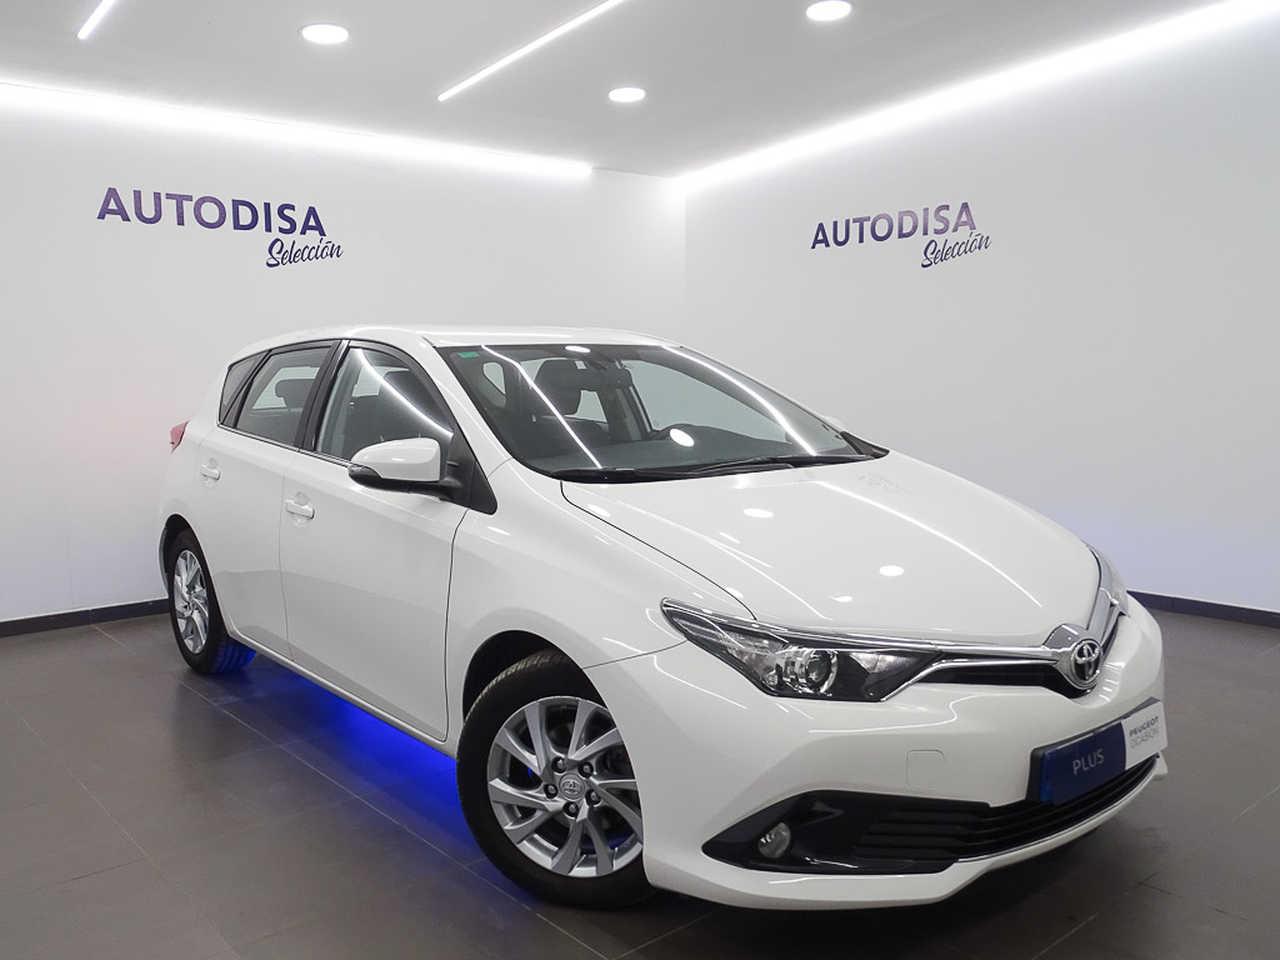 Array Toyota Auris 2015 Diésel por 11.495€ en Valencia